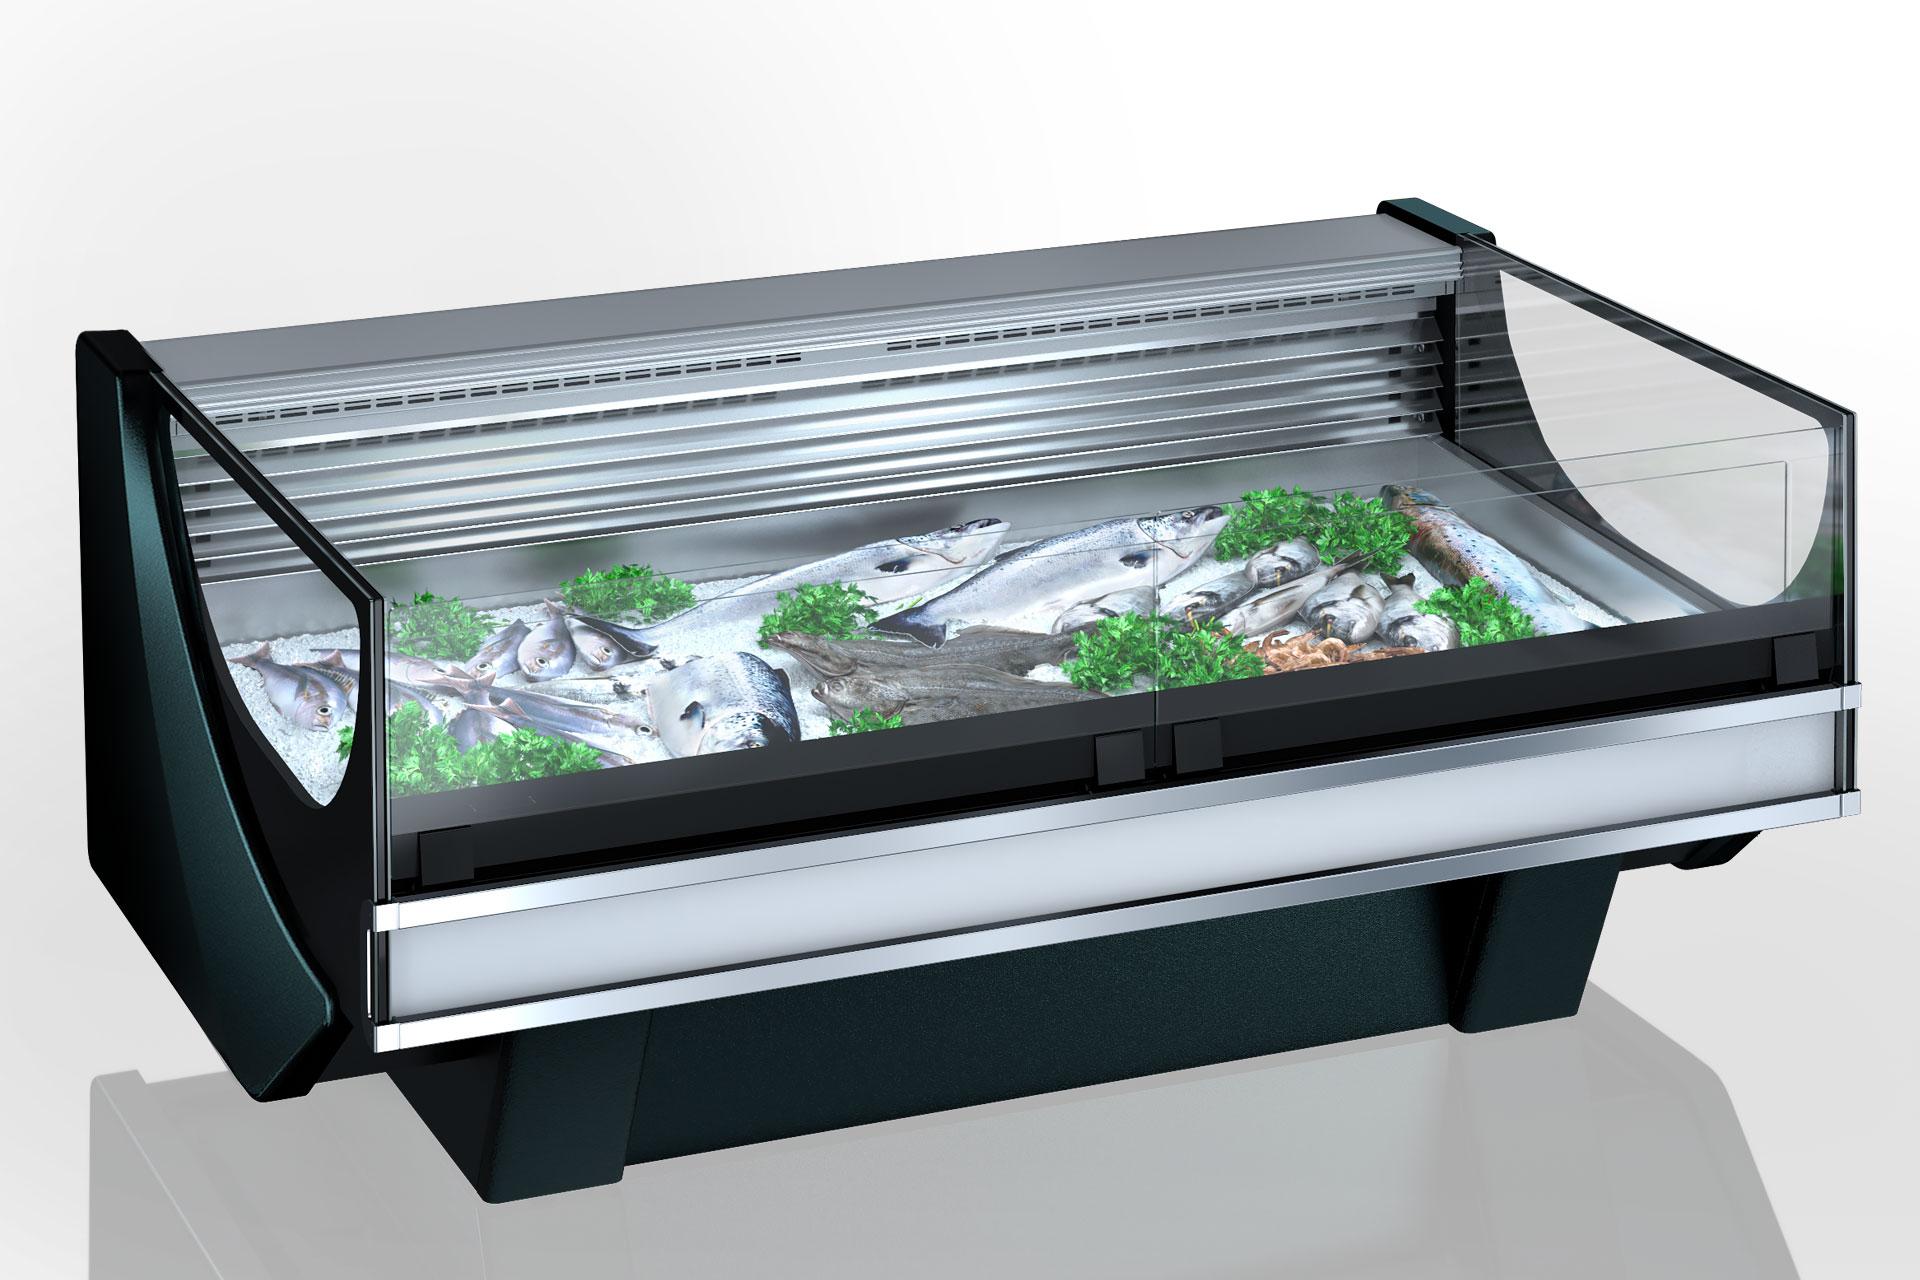 Refrigerated counters Missouri Cold Diamond MC 126 fish PS 130-SPLM/SPLA